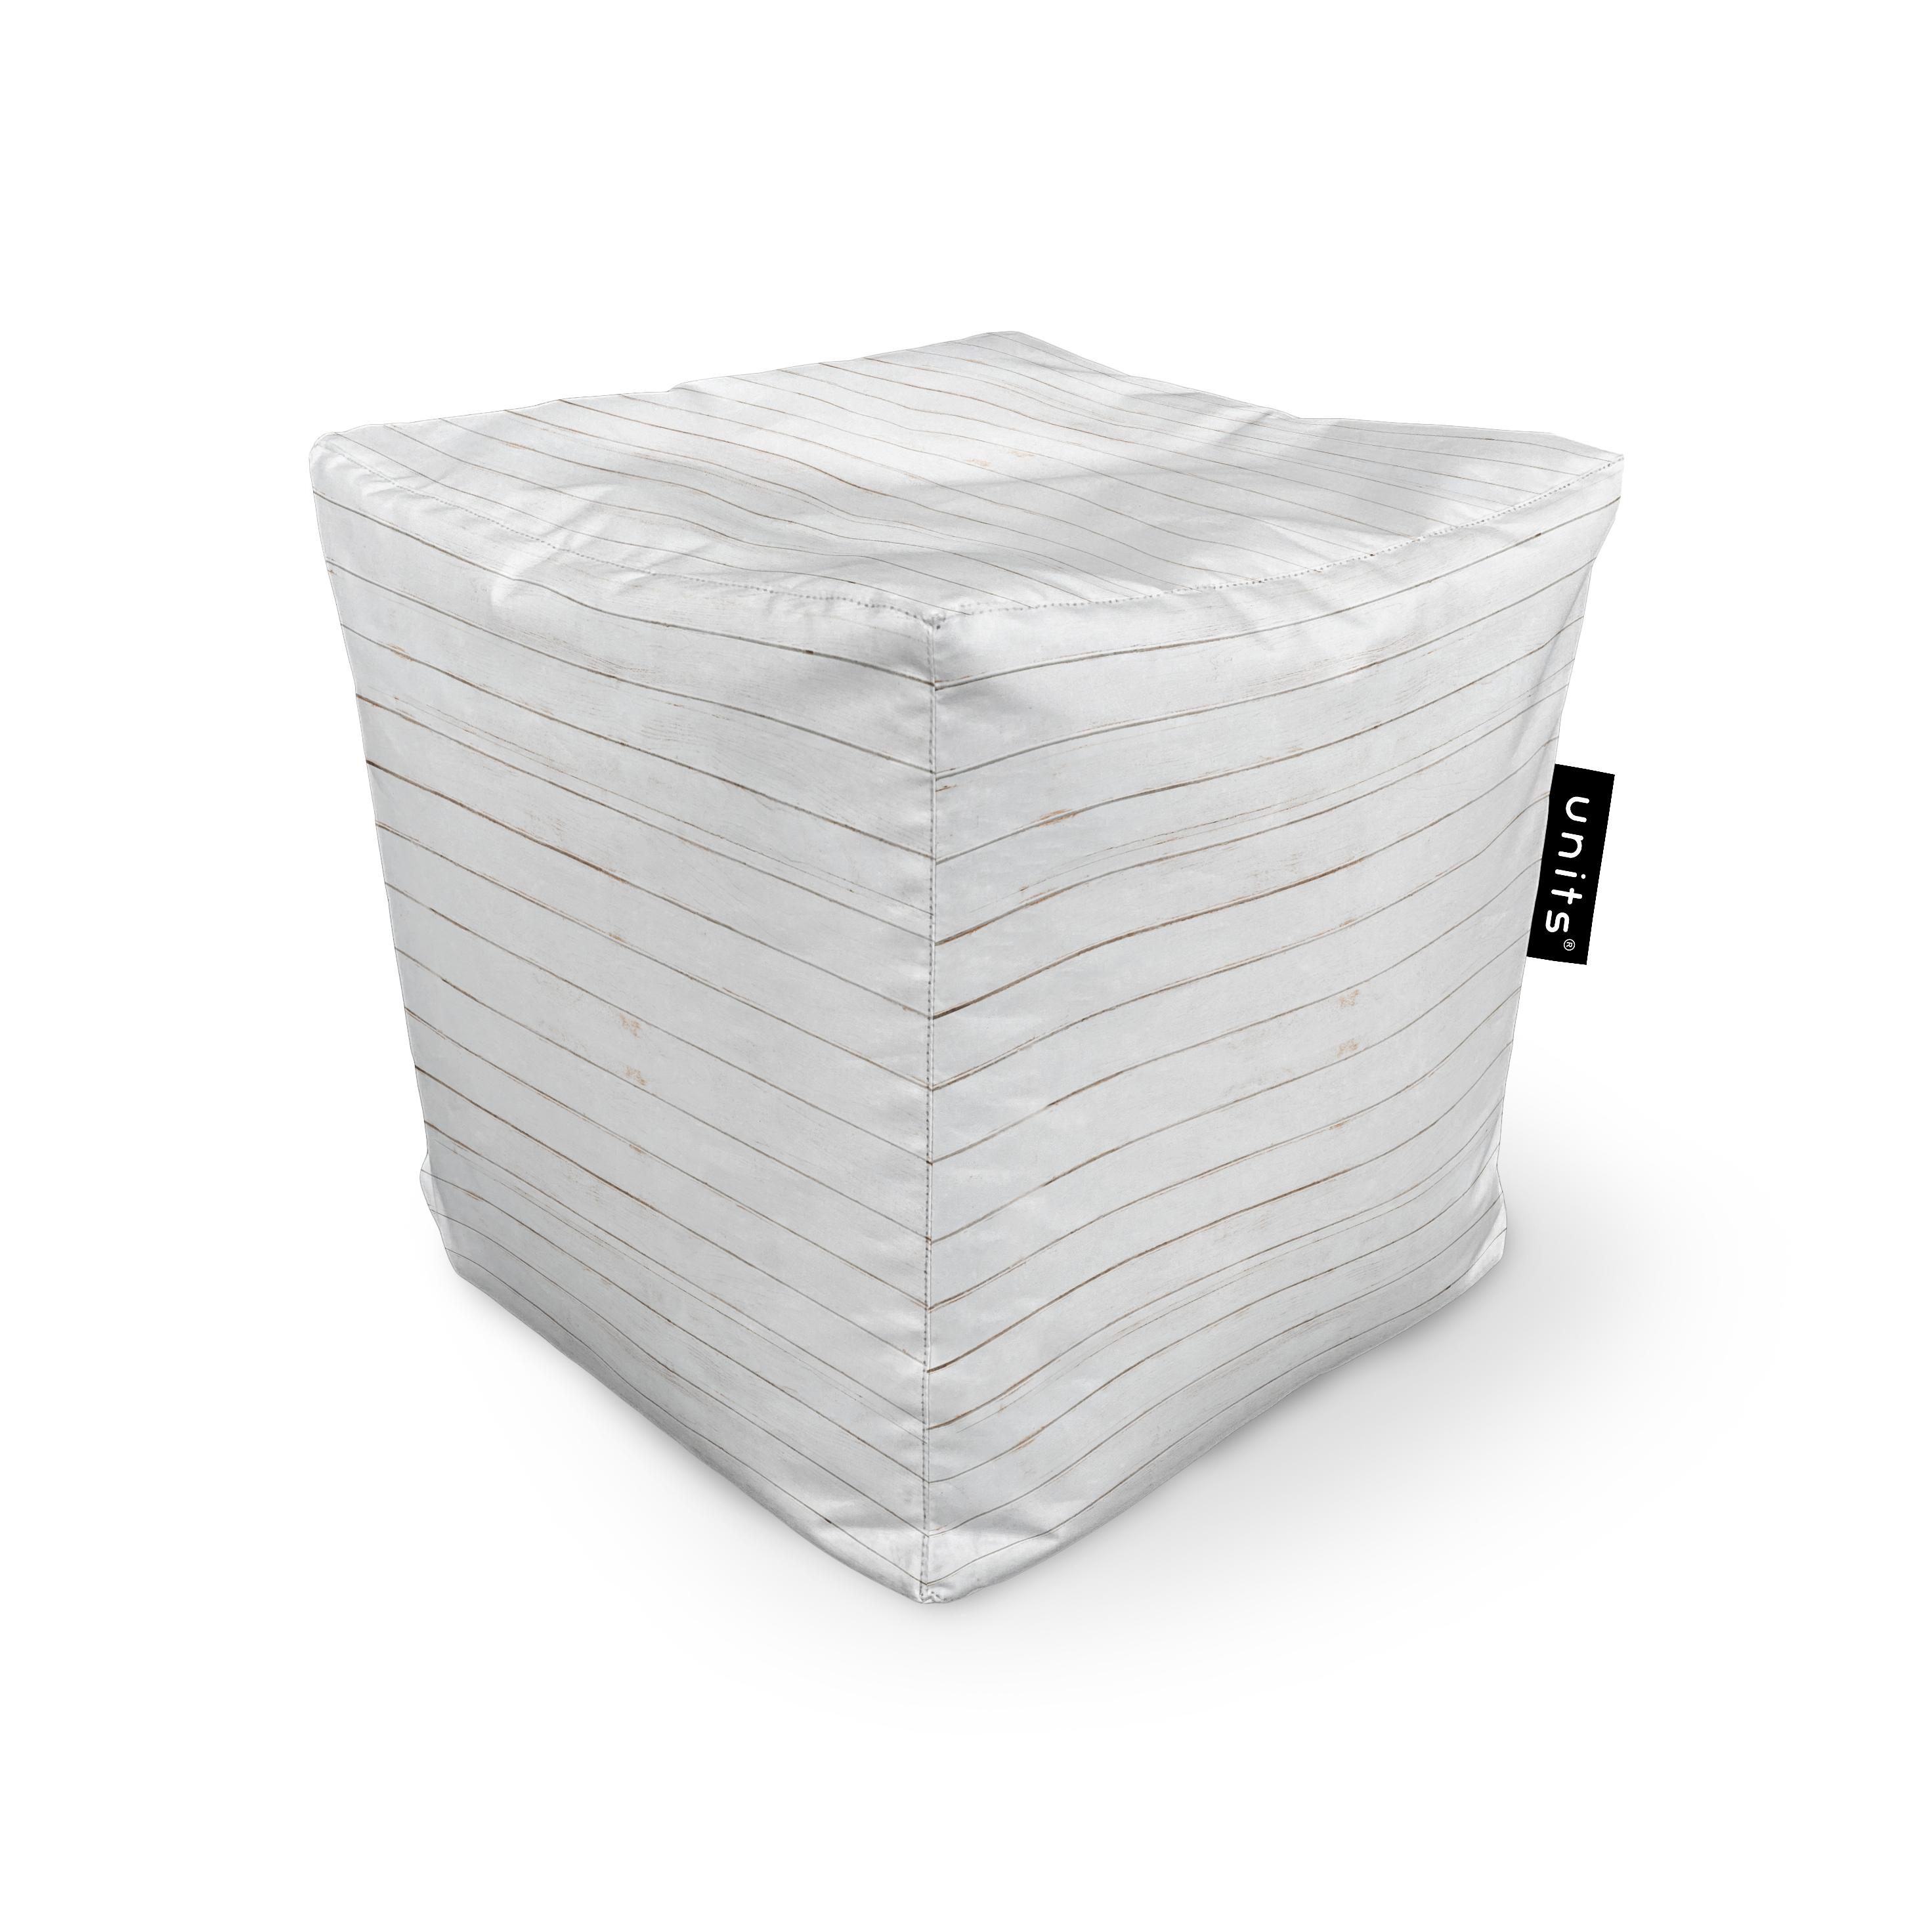 Fotoliu units puf (bean bags) tip cub, impermeabil, lemn alb imagine